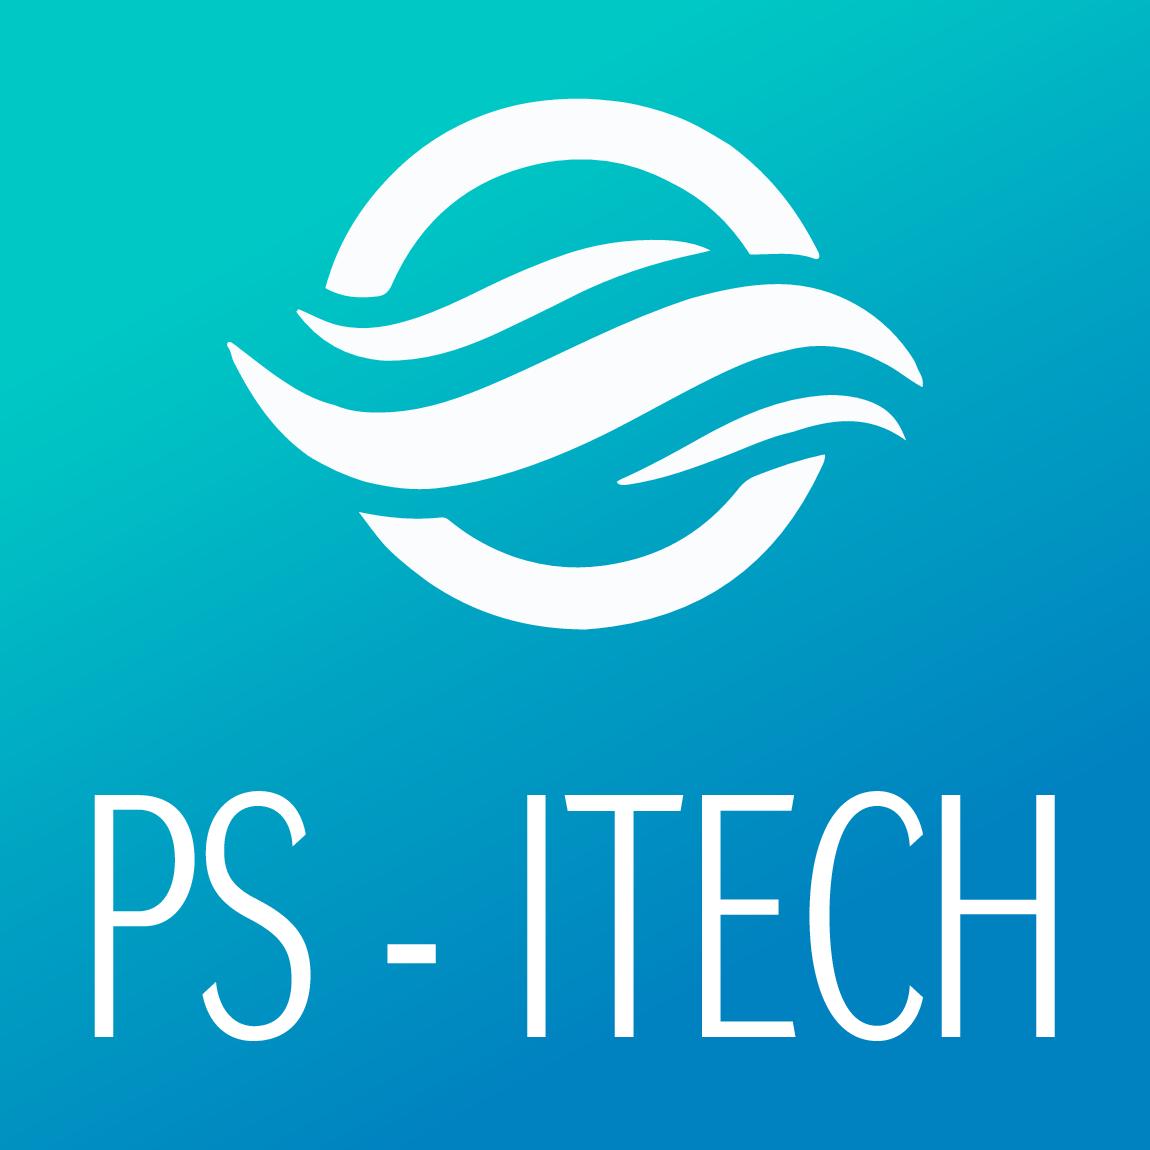 PS-ITECH